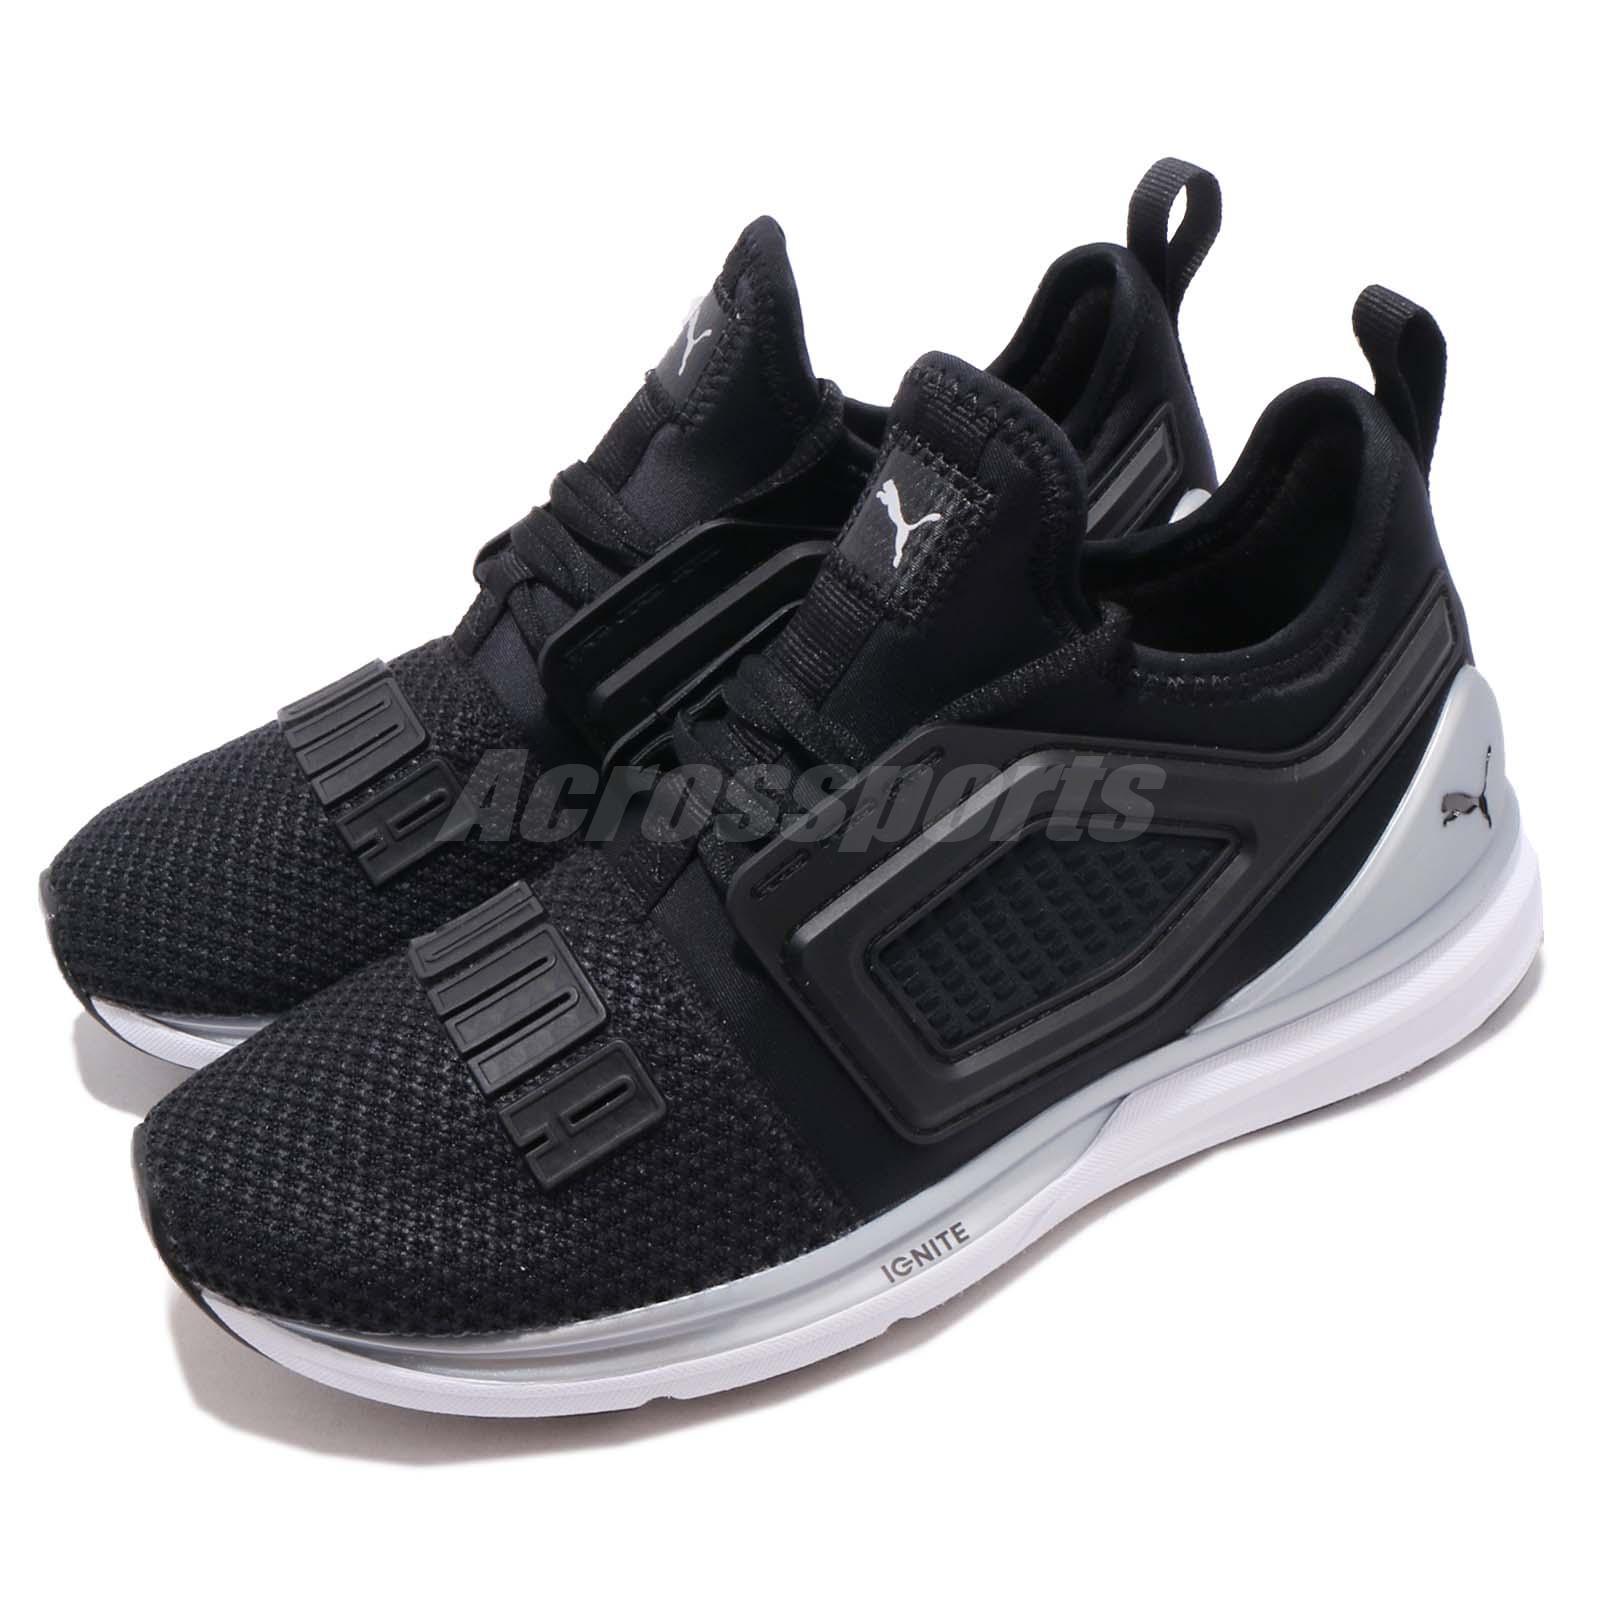 Dettagli su Puma Ignite Limitless 2 Black Silver White Men Running Shoes Sneakers 191293 13